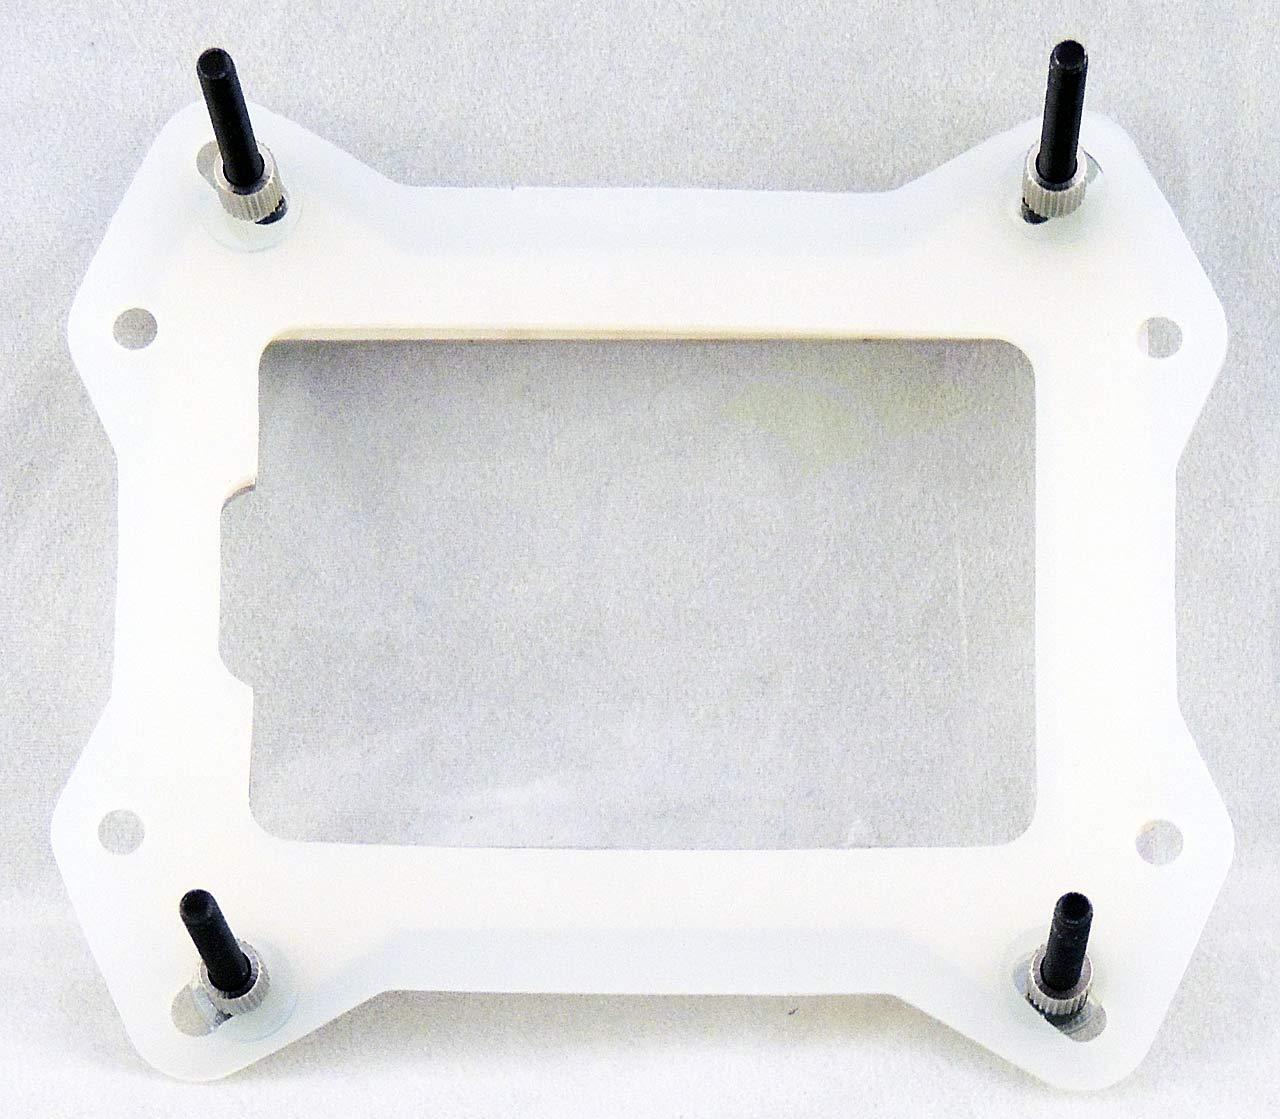 06-mount-bracket-intel-top.jpg